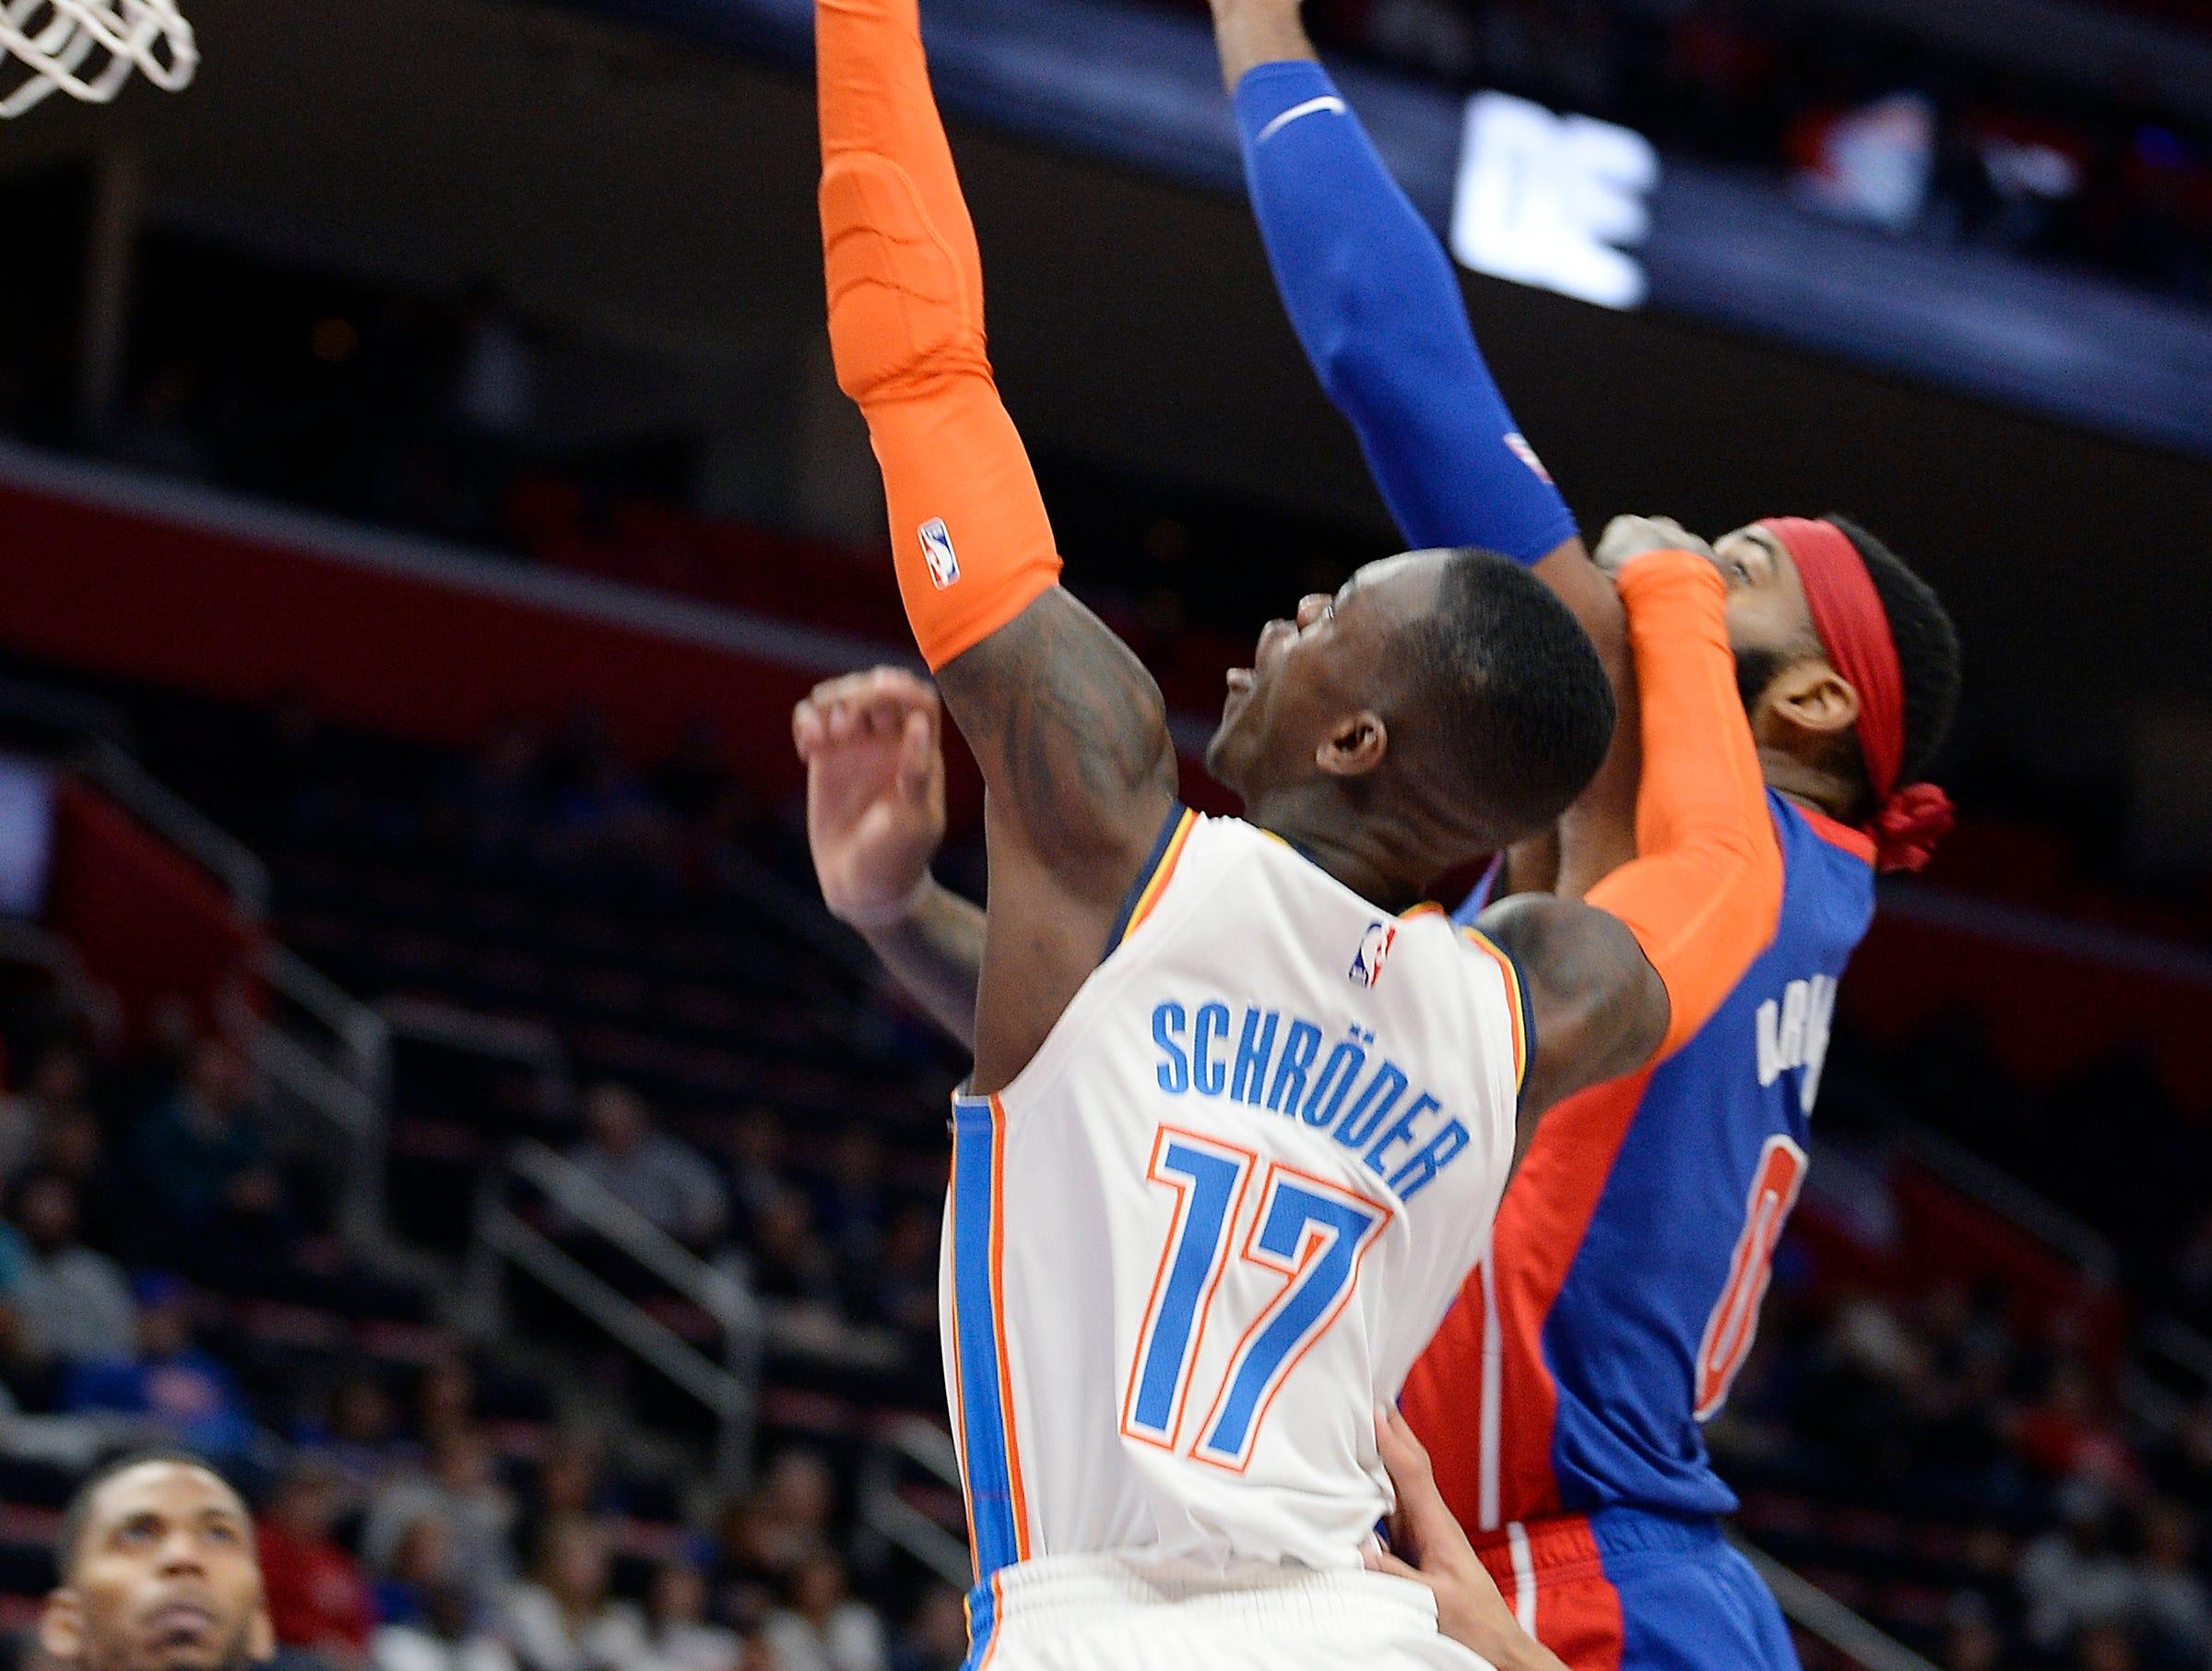 Thunder's Dennis Schroder scores over Pistons' Andre Drummond in the fourth quarter.